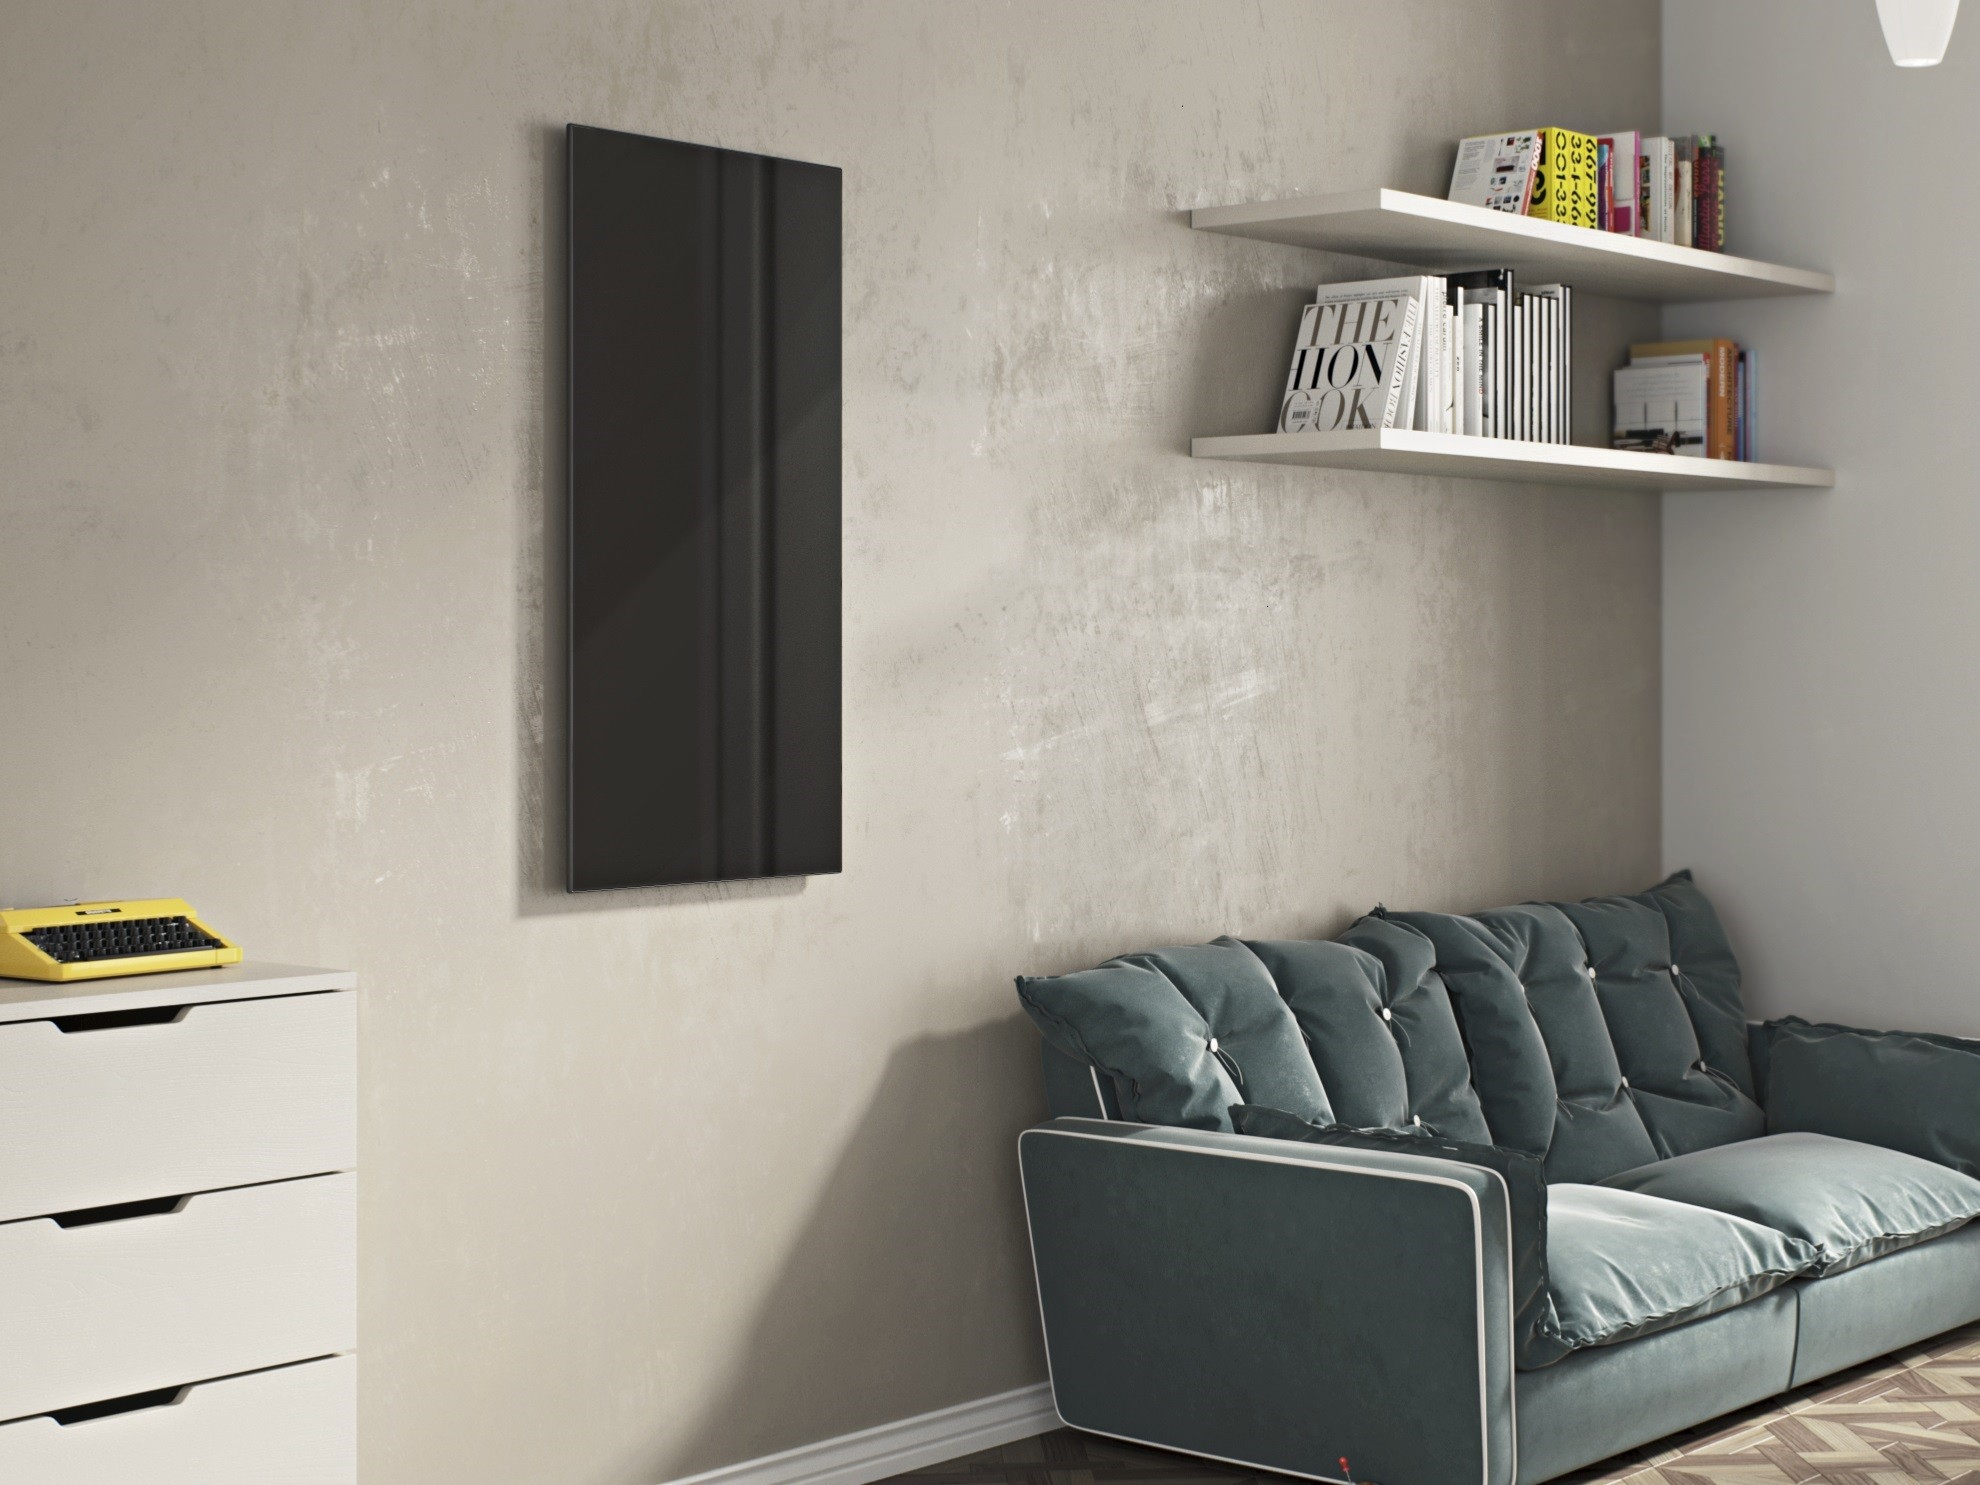 infrarotheizung glas 60 x 90 cm 600 watt schwarz rahmenlos. Black Bedroom Furniture Sets. Home Design Ideas